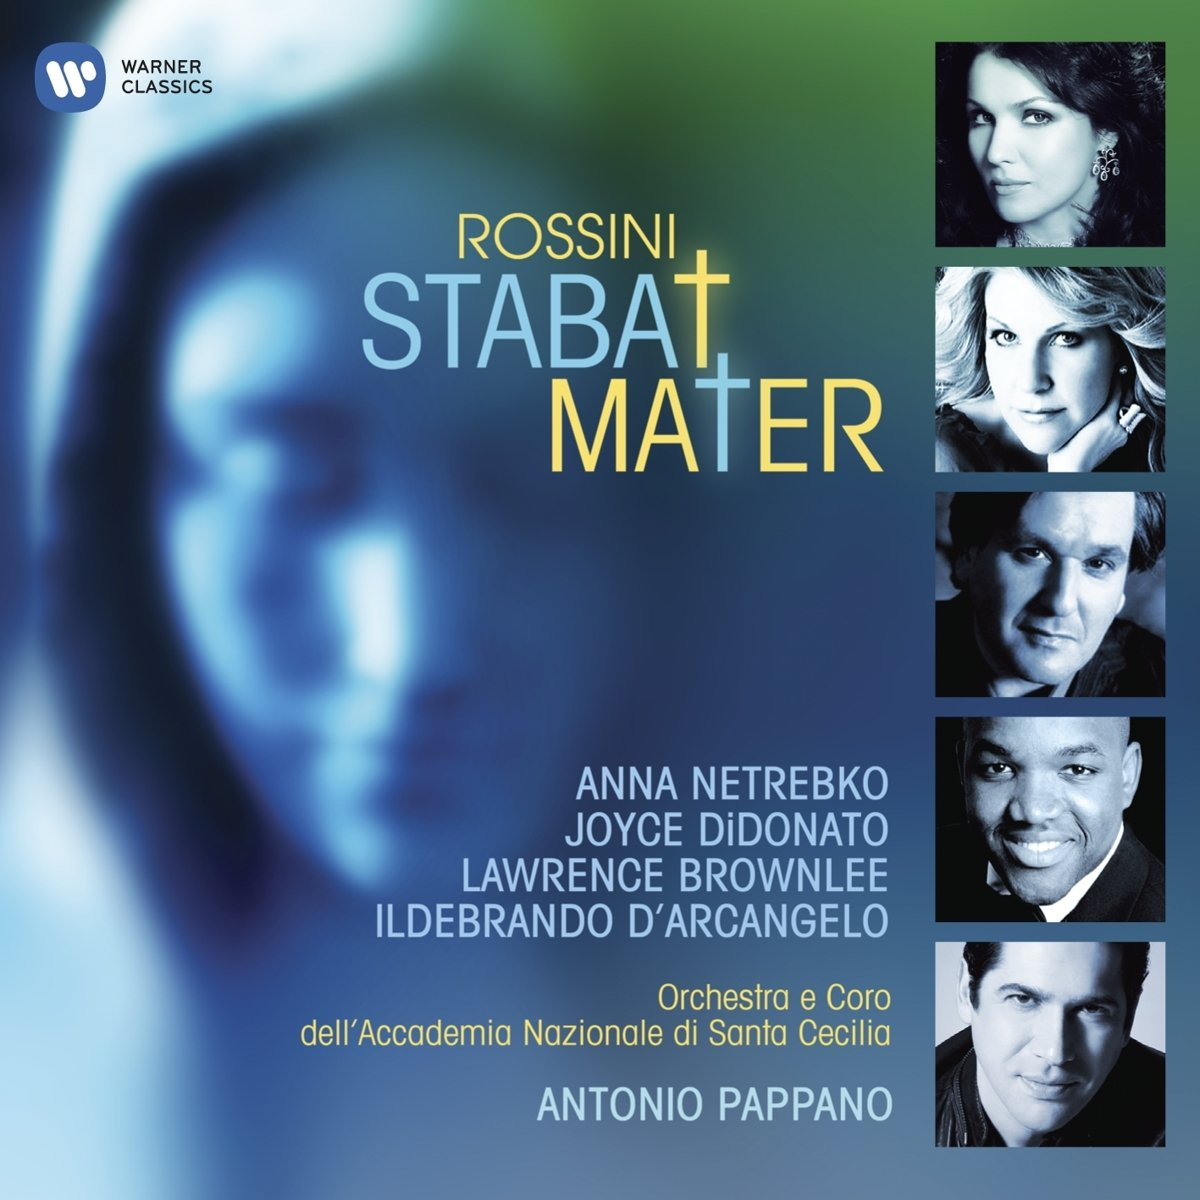 Rossini: Stabat Mater by Warner Bros.